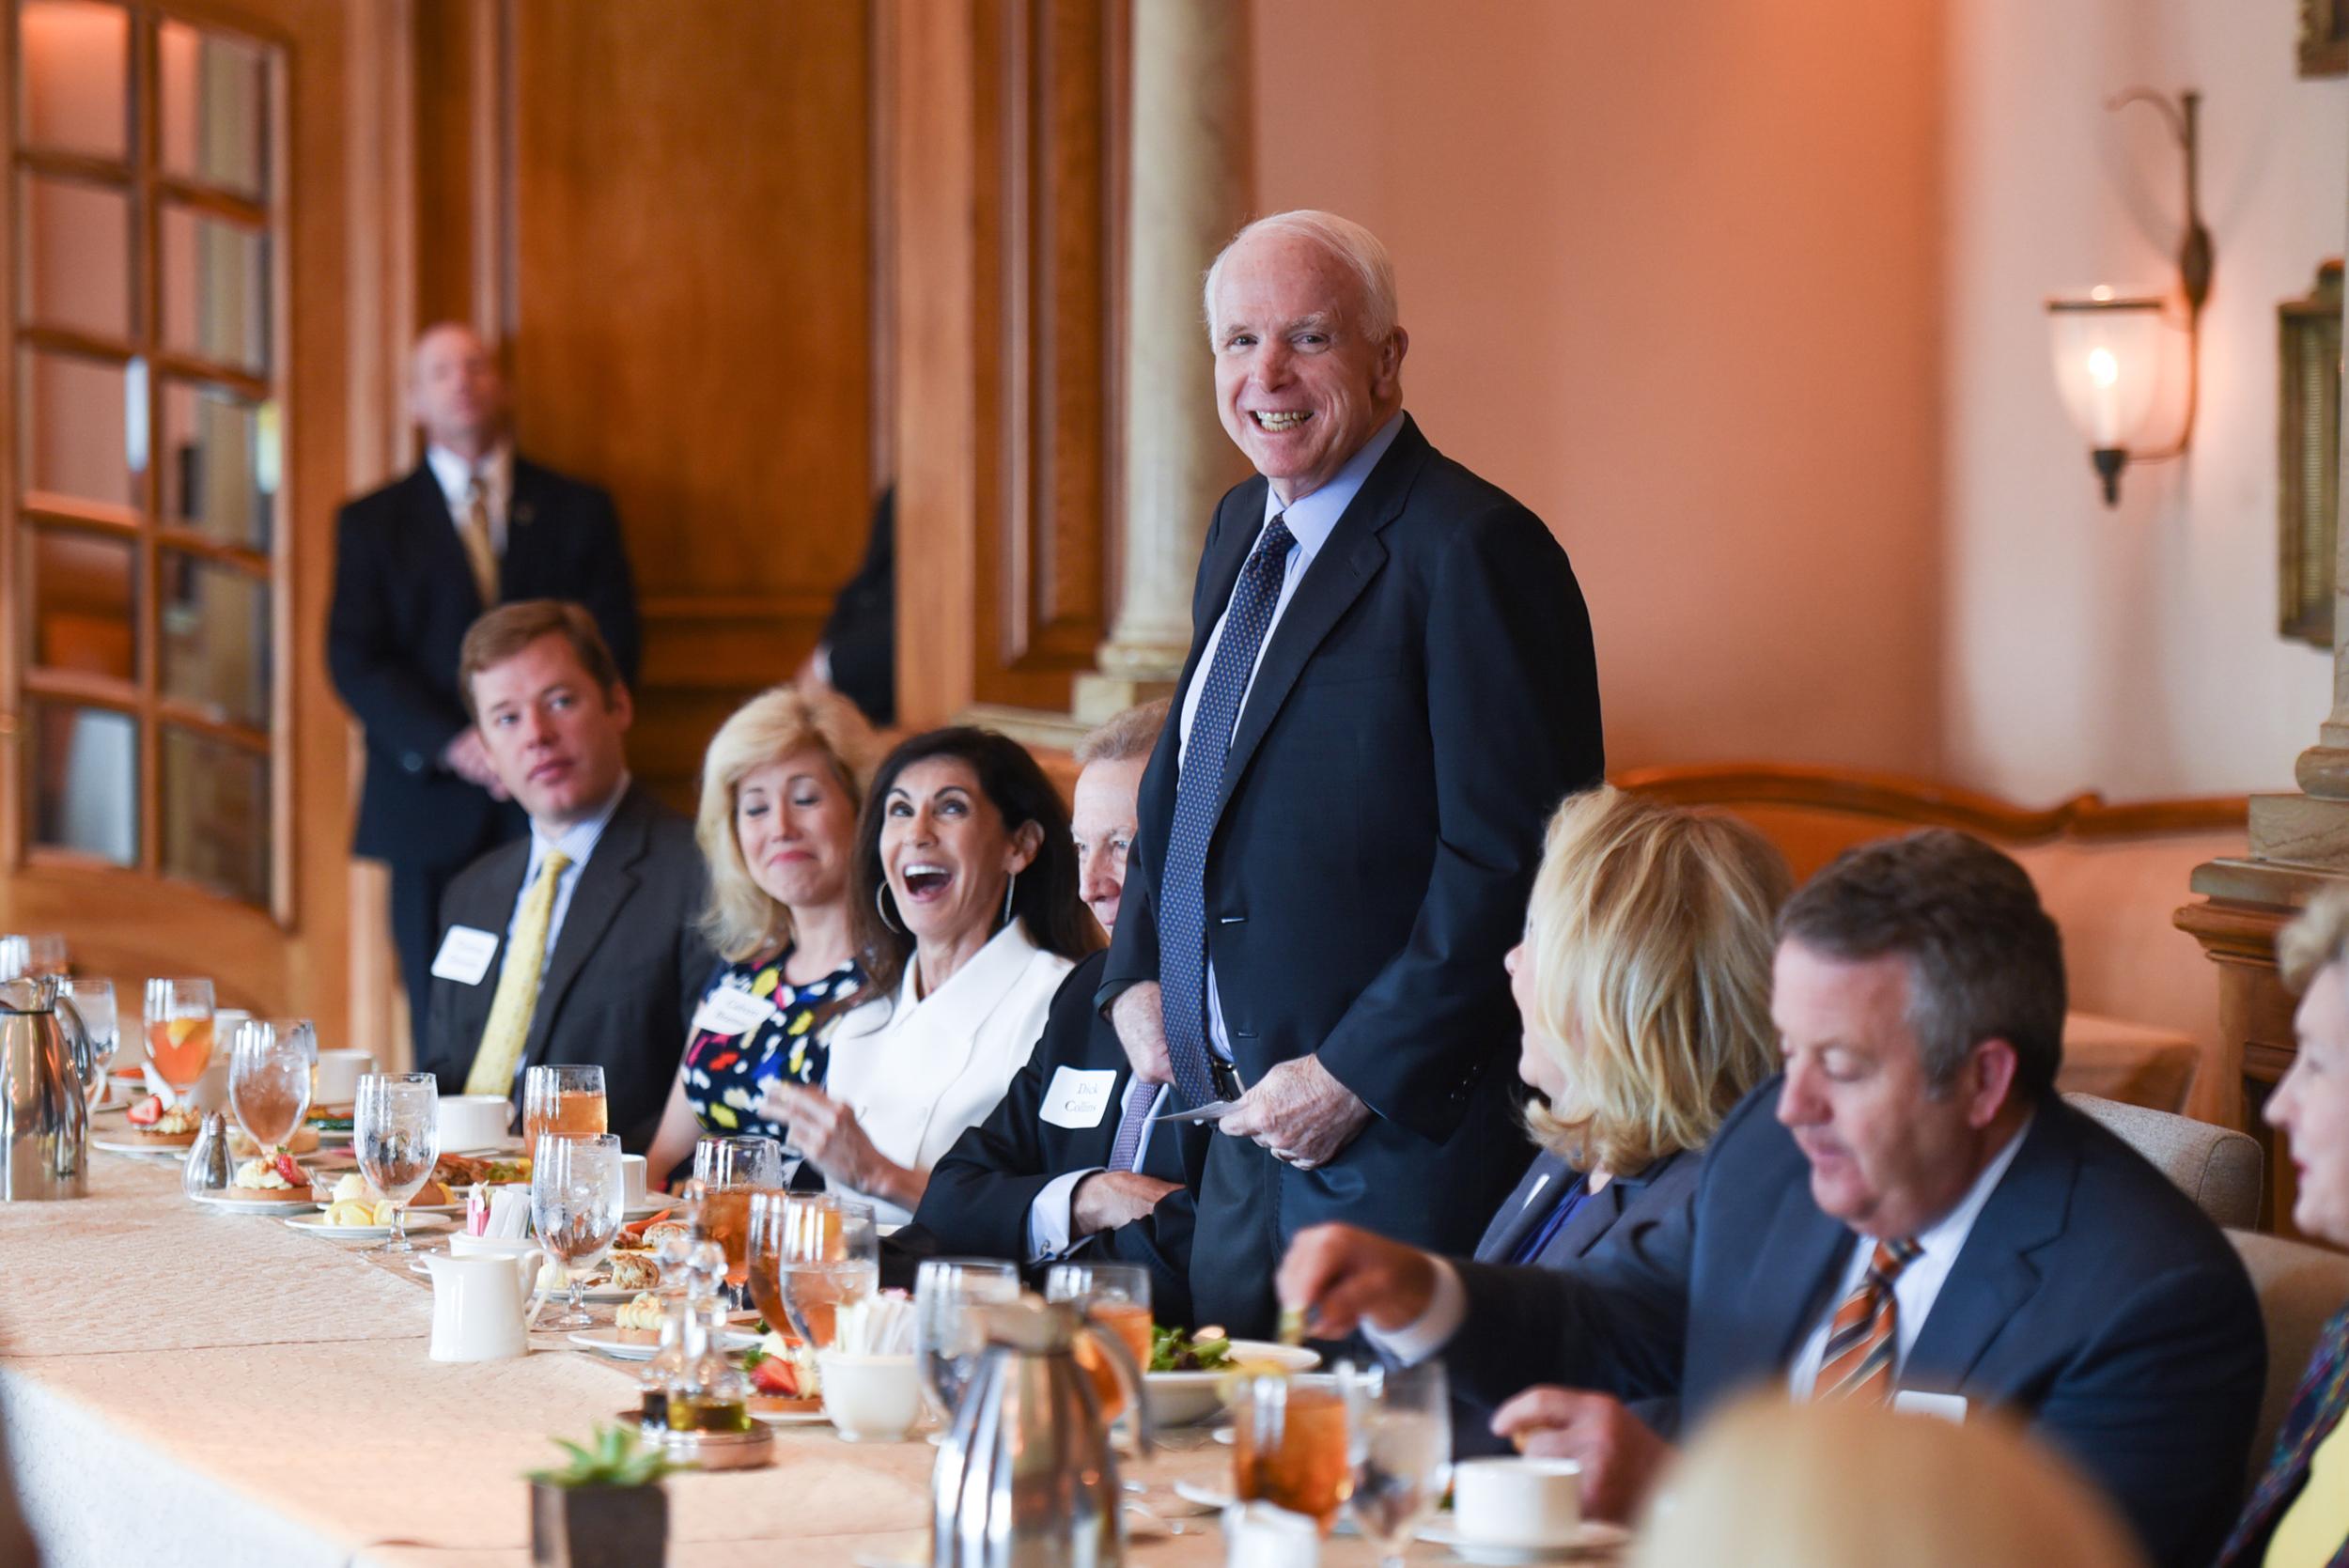 Senator John McCain (R-AZ) thanks supporters at a Dallas luncheon in June, 2016.